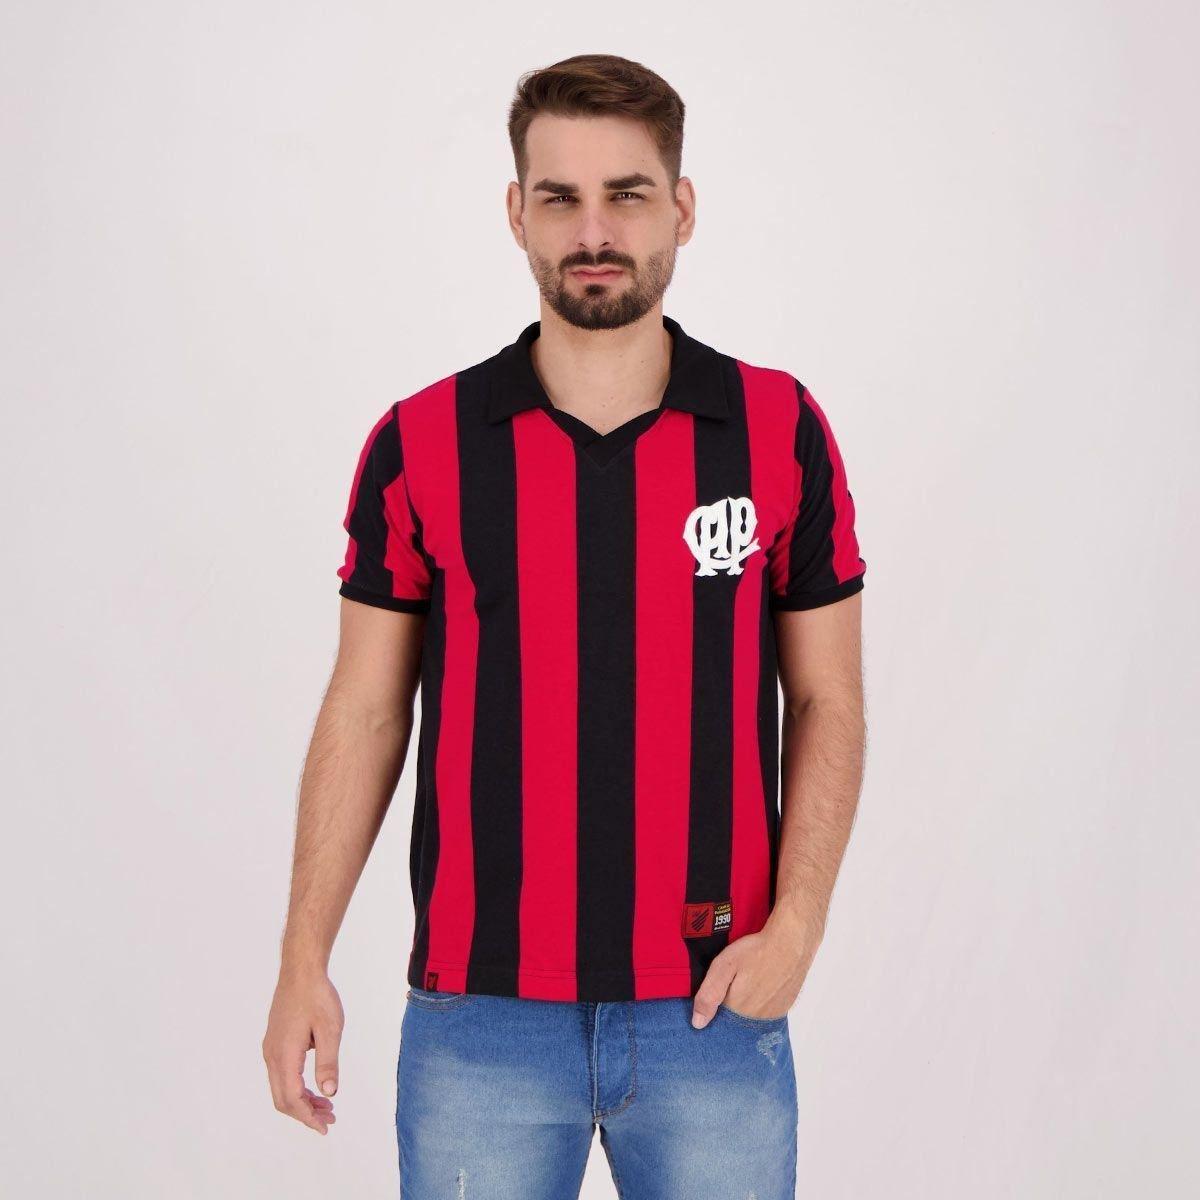 Camisa Athletico Paranaense Retrô 1990